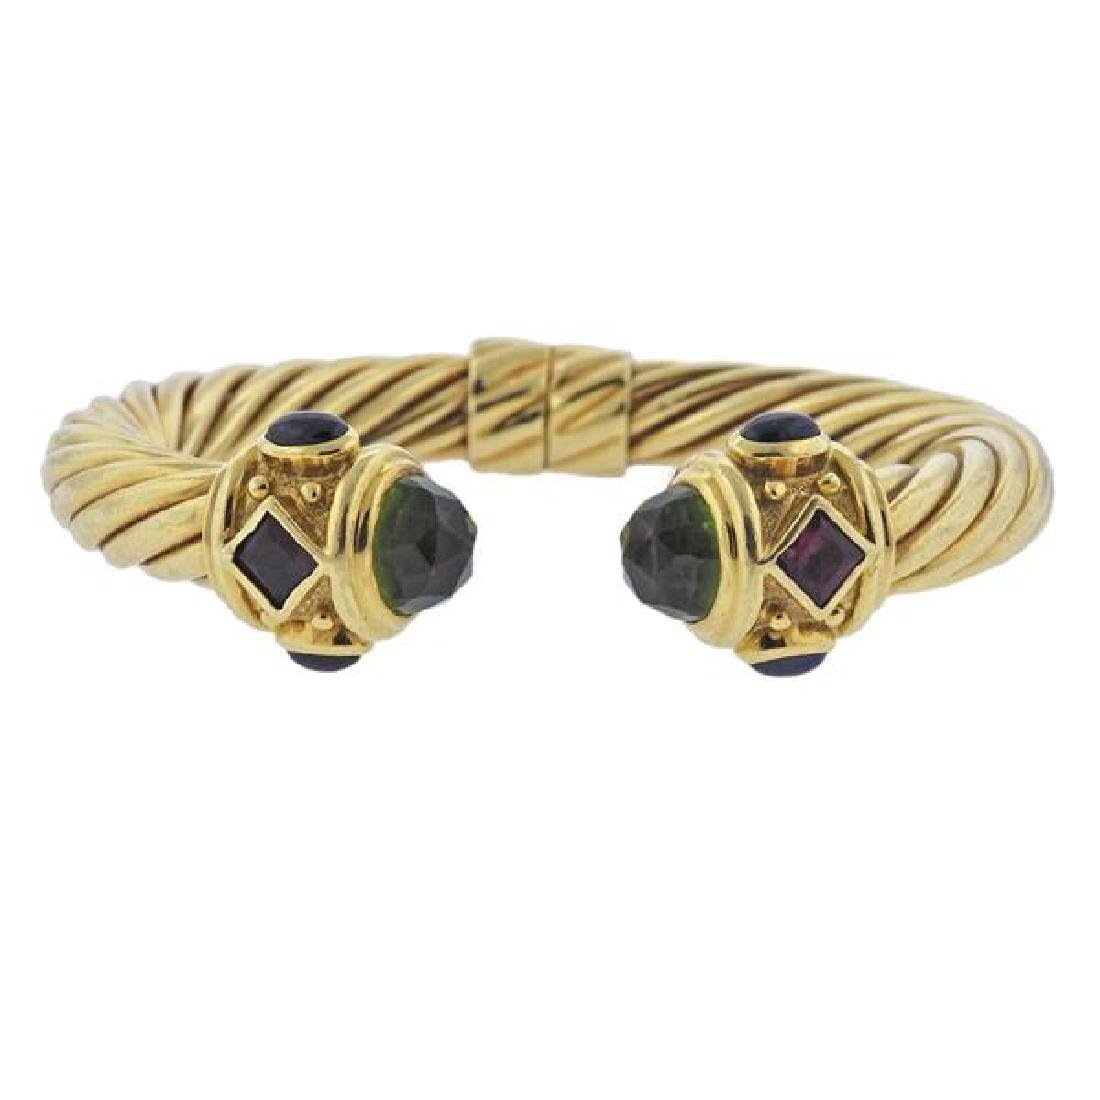 David Yurman Renaissance 18K Gold Multi Stone Bracelet